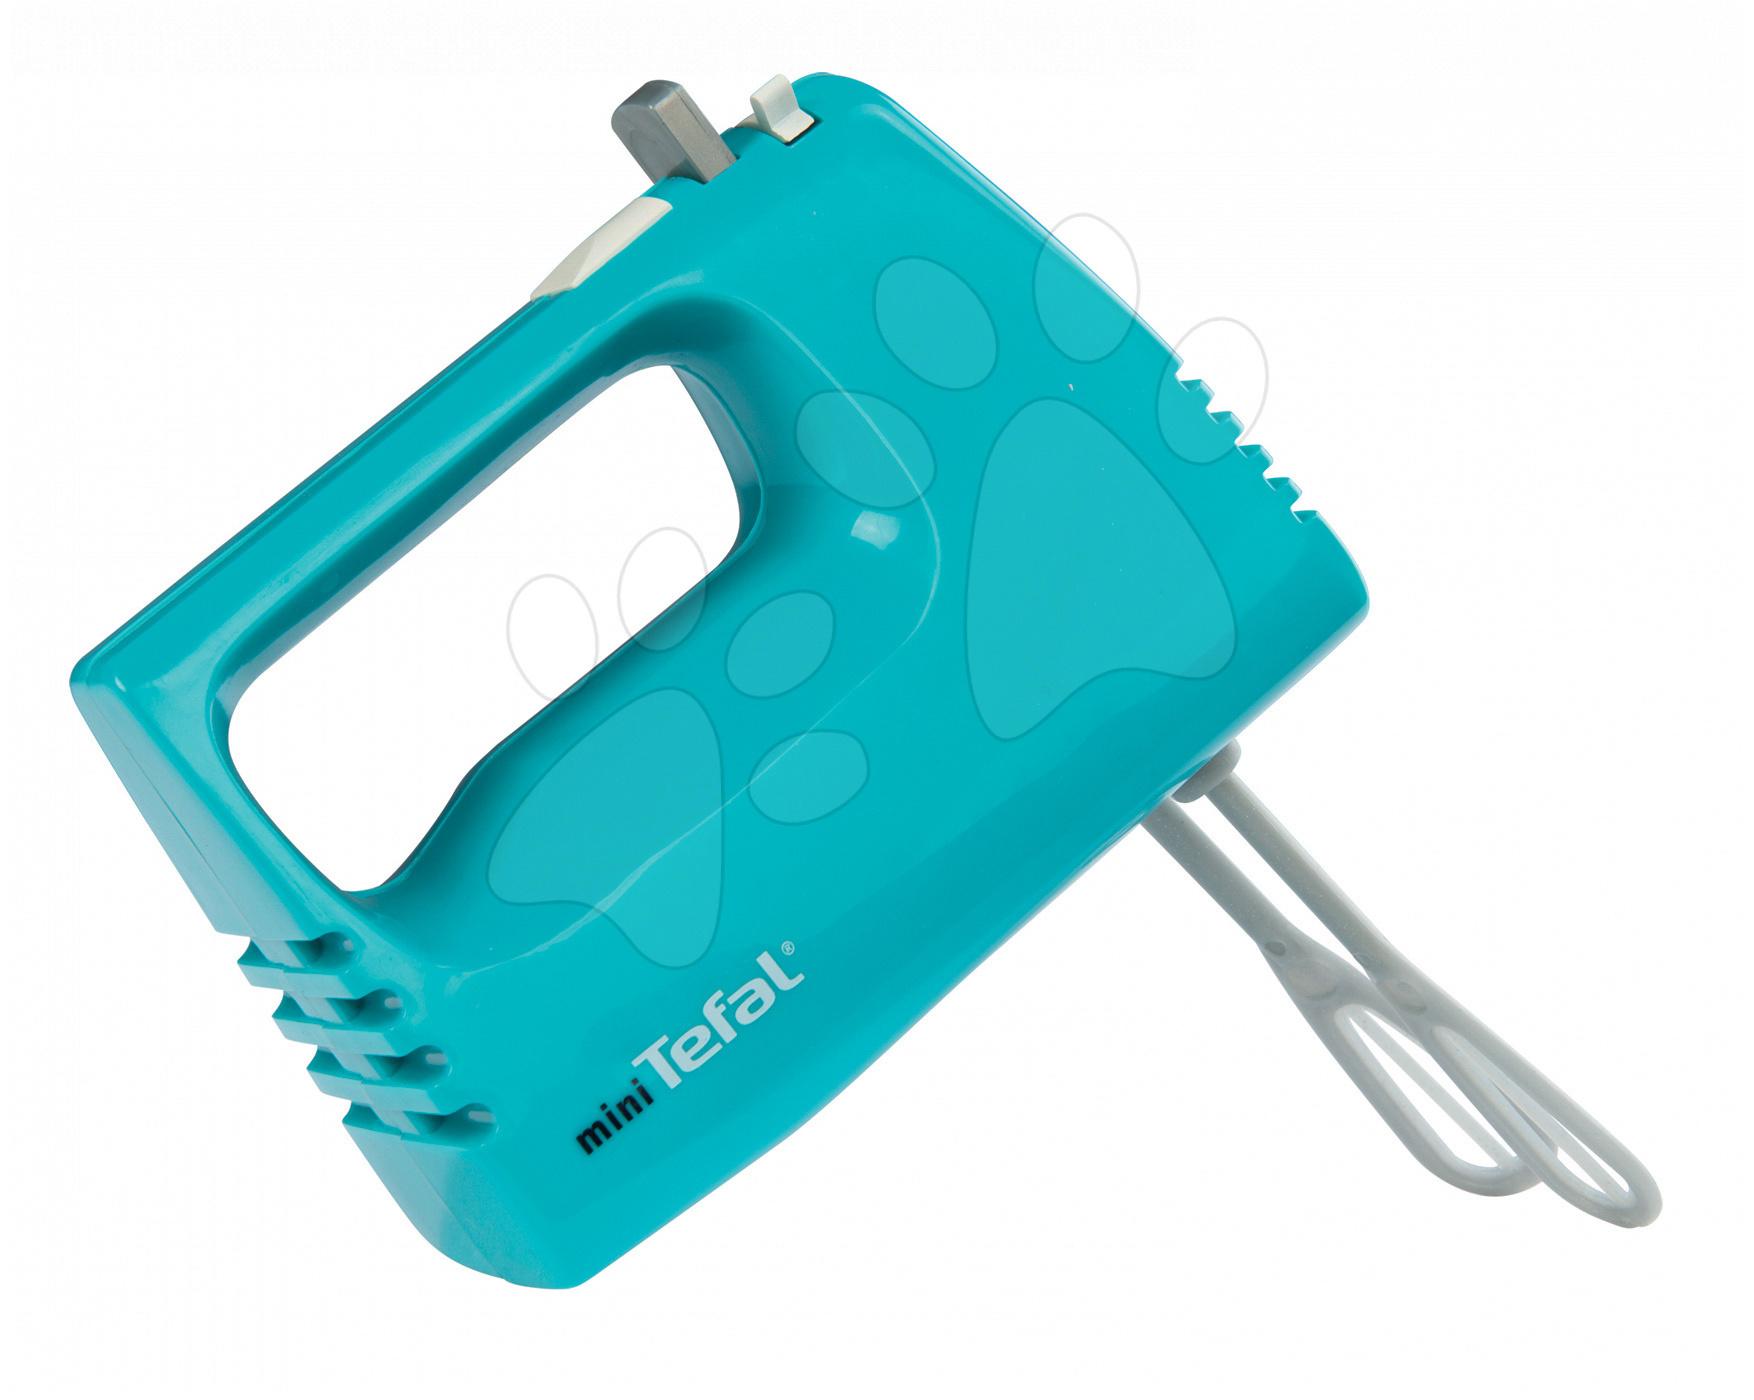 Smoby ruční mixér Mini Tefal s metličkami 310500 modrý